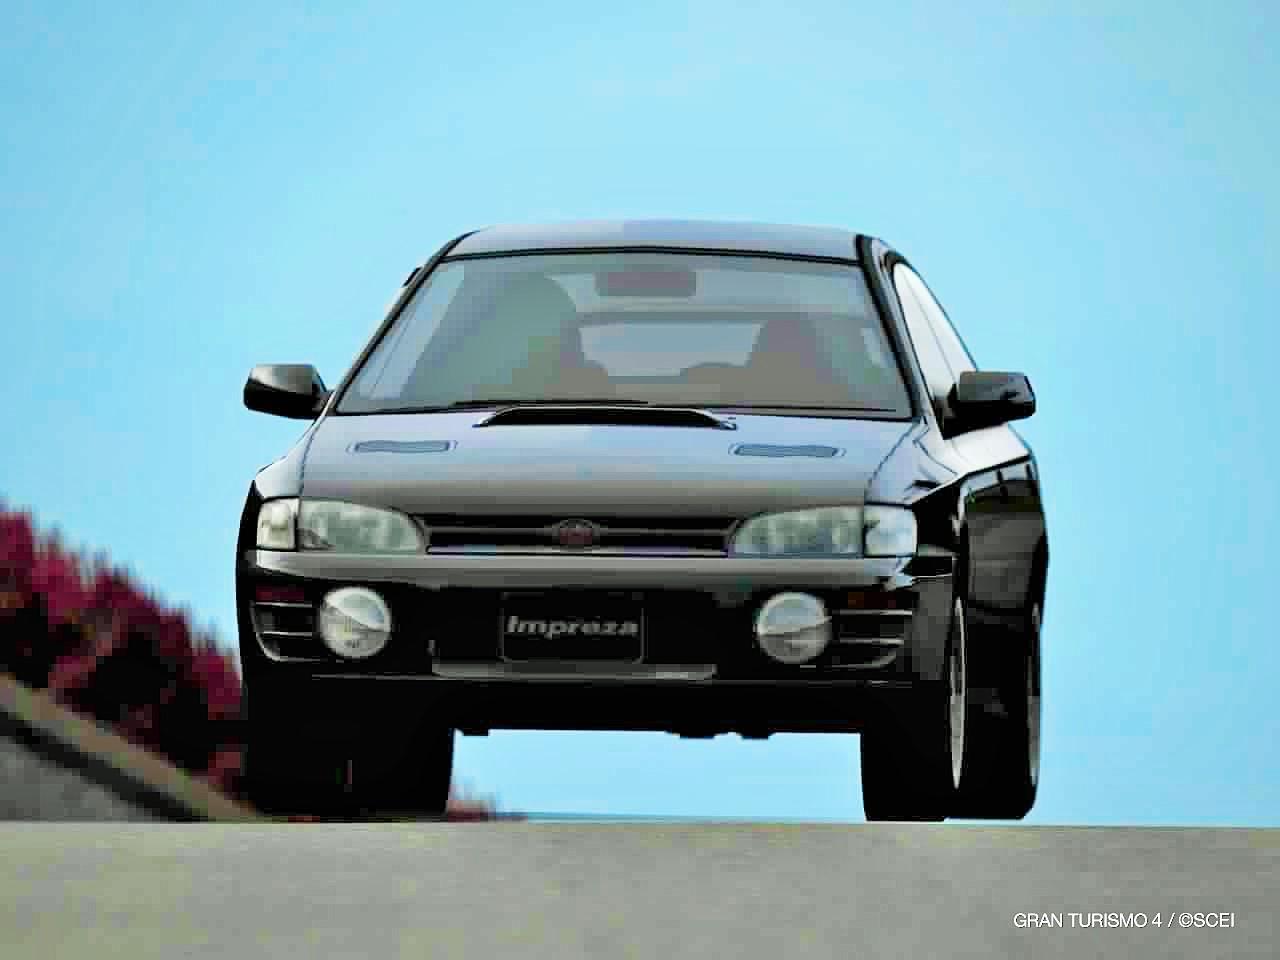 Gran Turismo Photo Dump: GT4 1994 Subaru IMPREZA Sedan WRX STi at ...